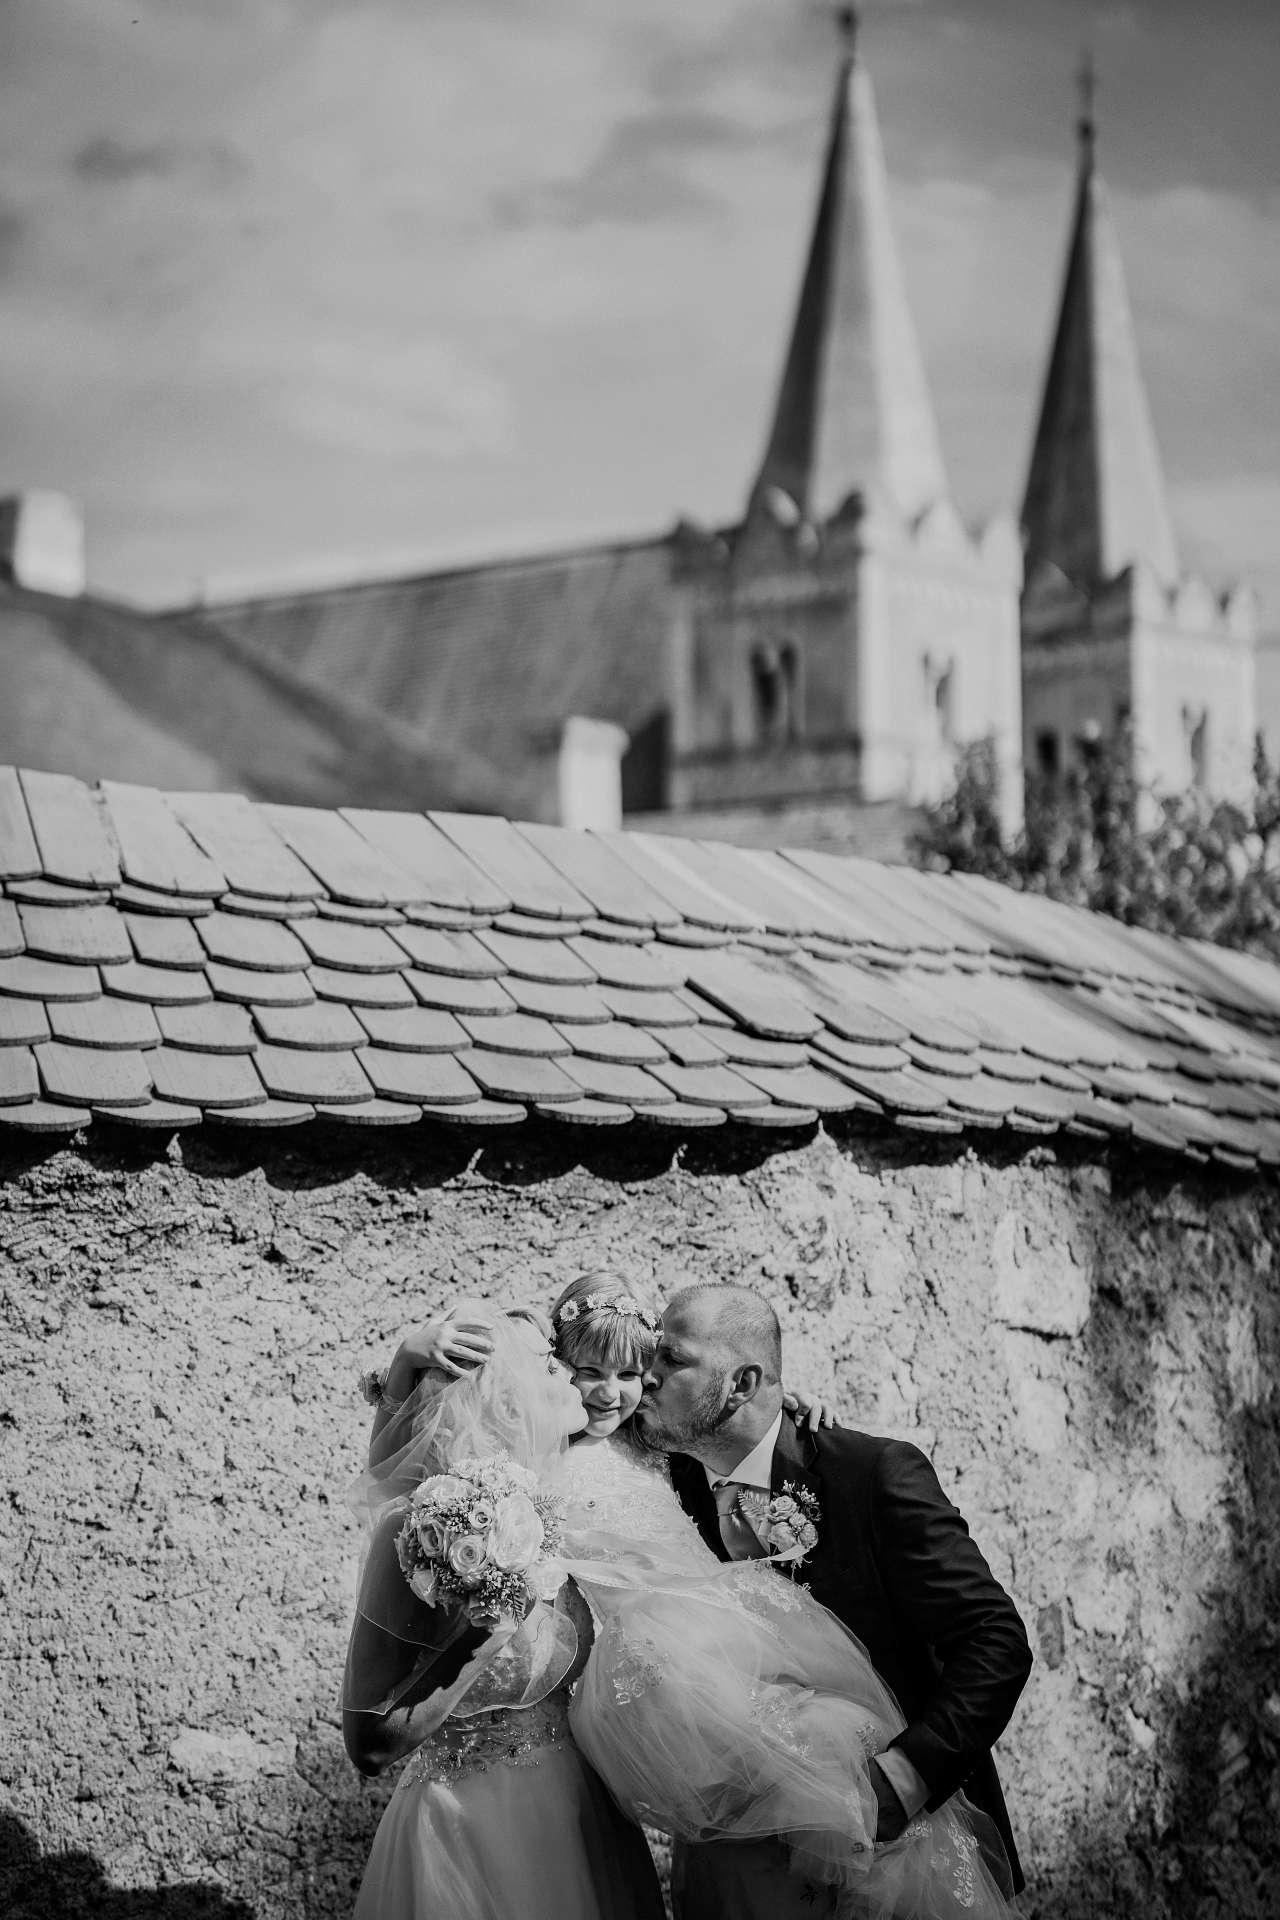 svadobny fotograf spis